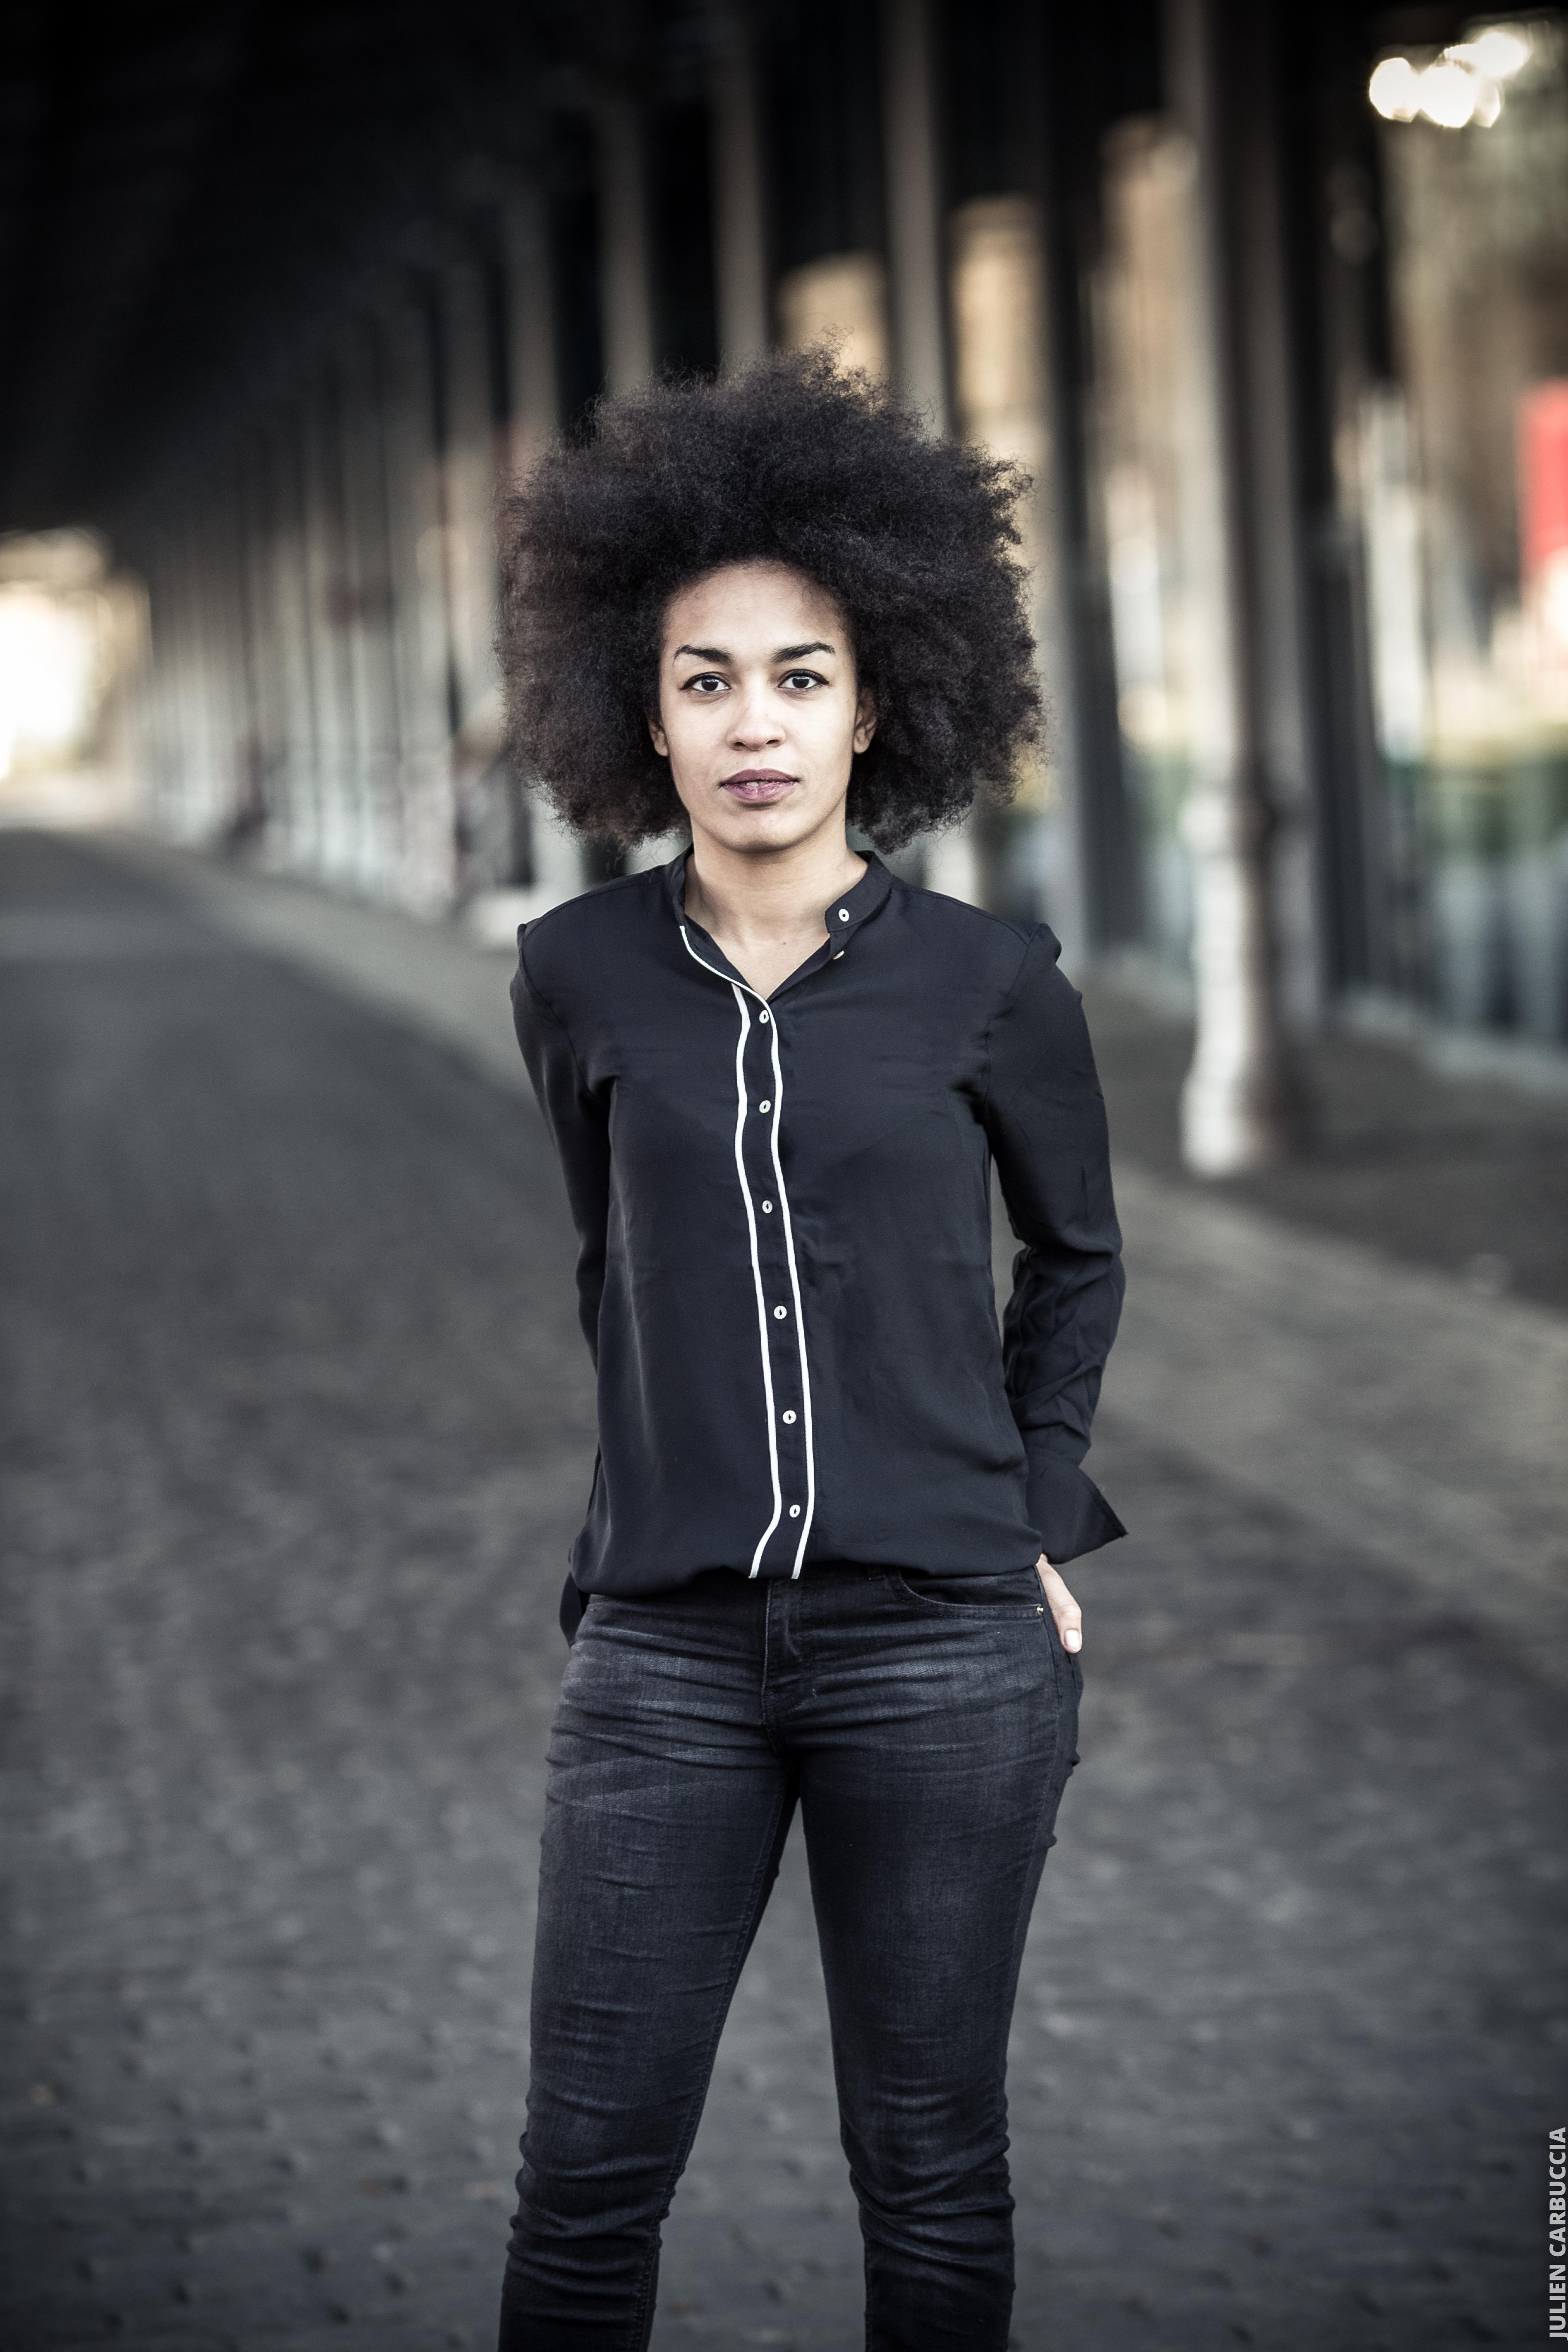 Marina Monmirel 20